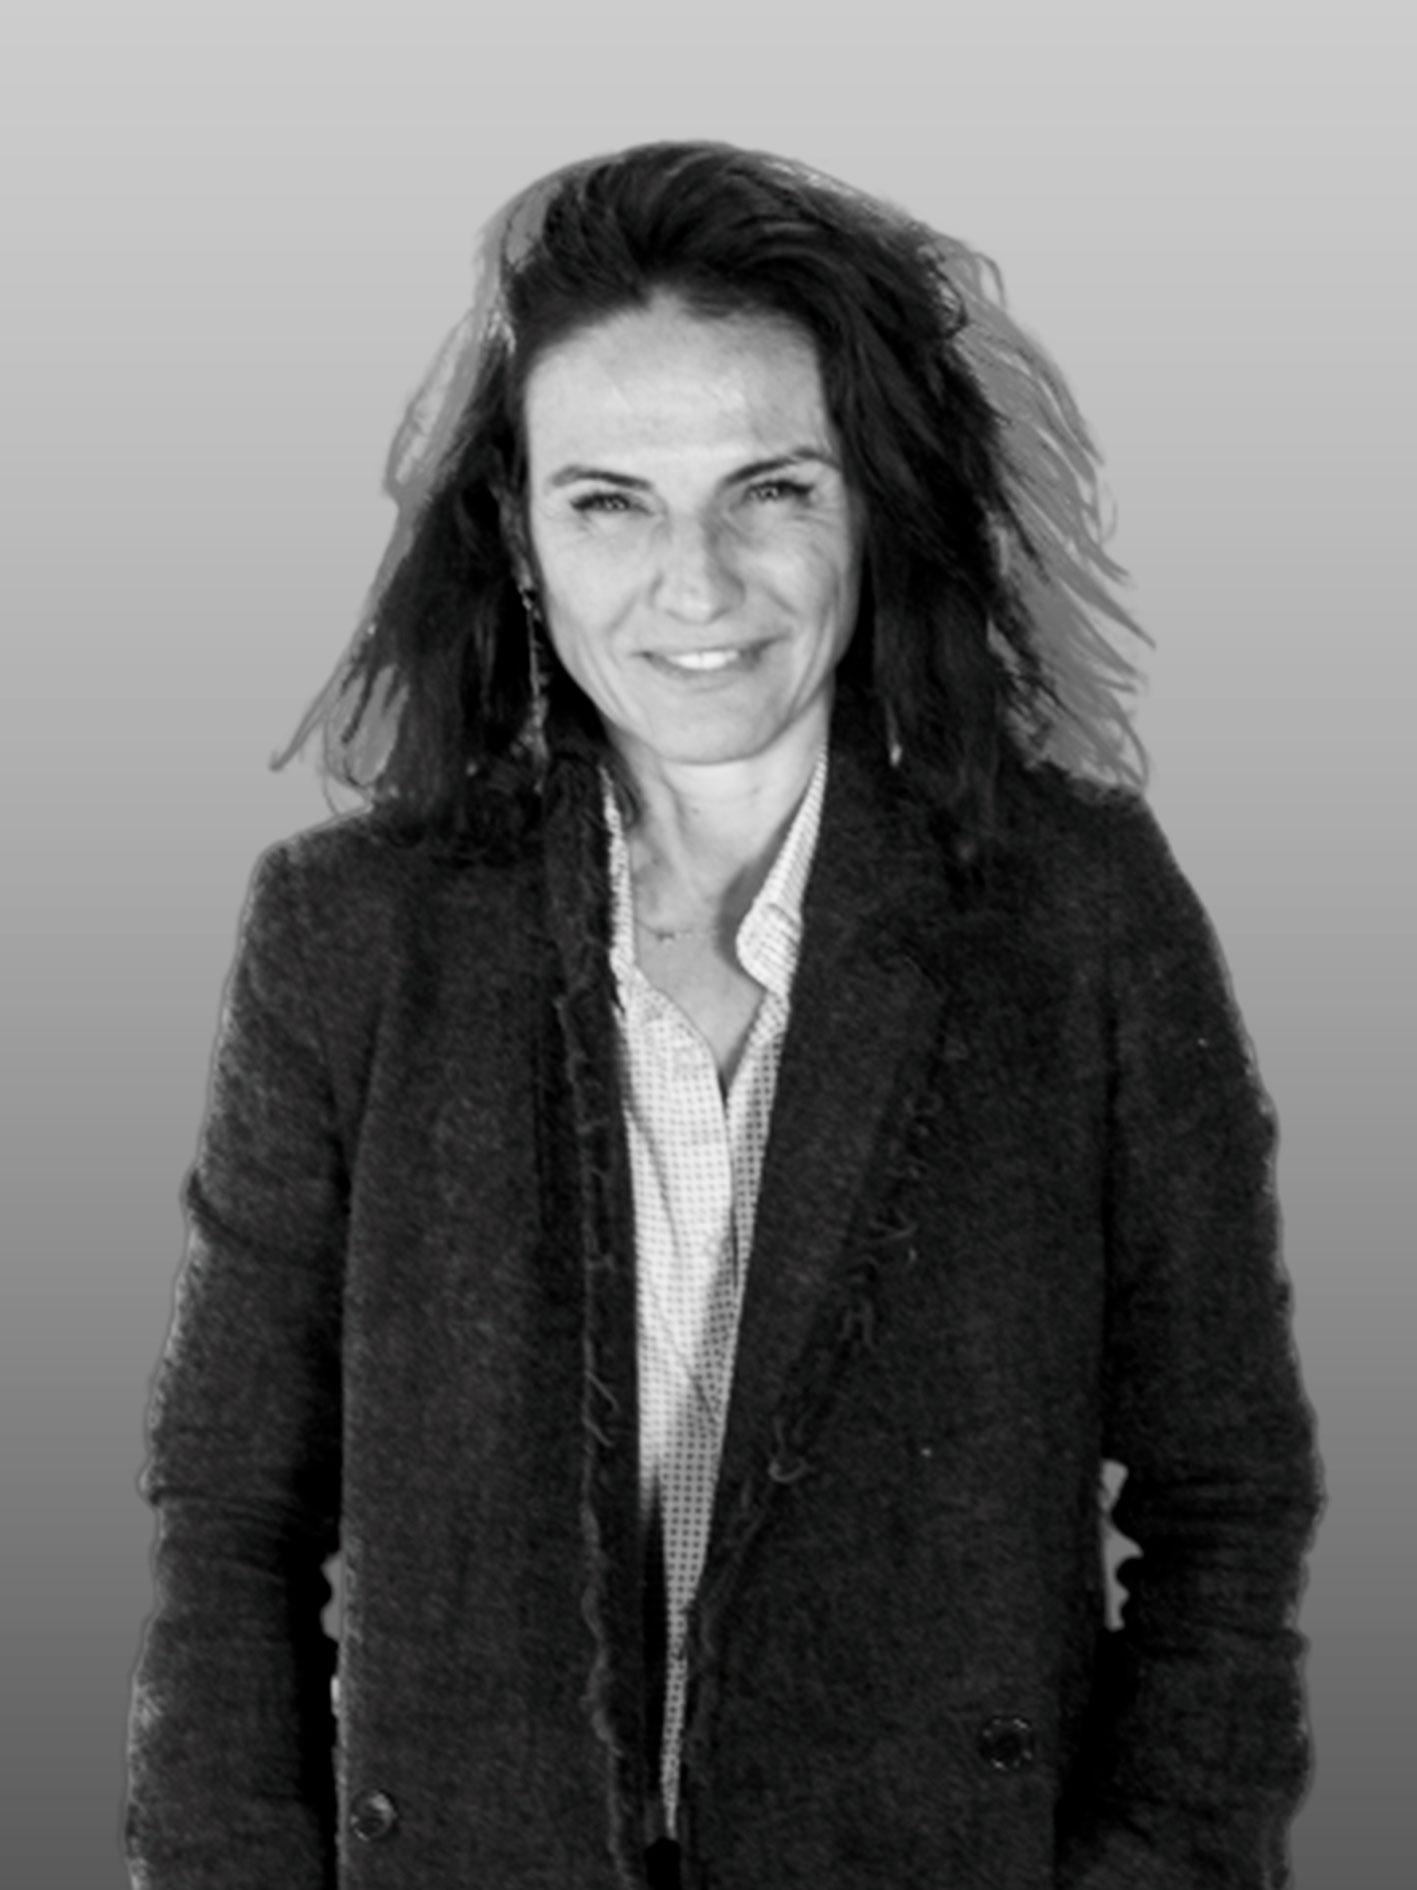 Silvia Gozalo